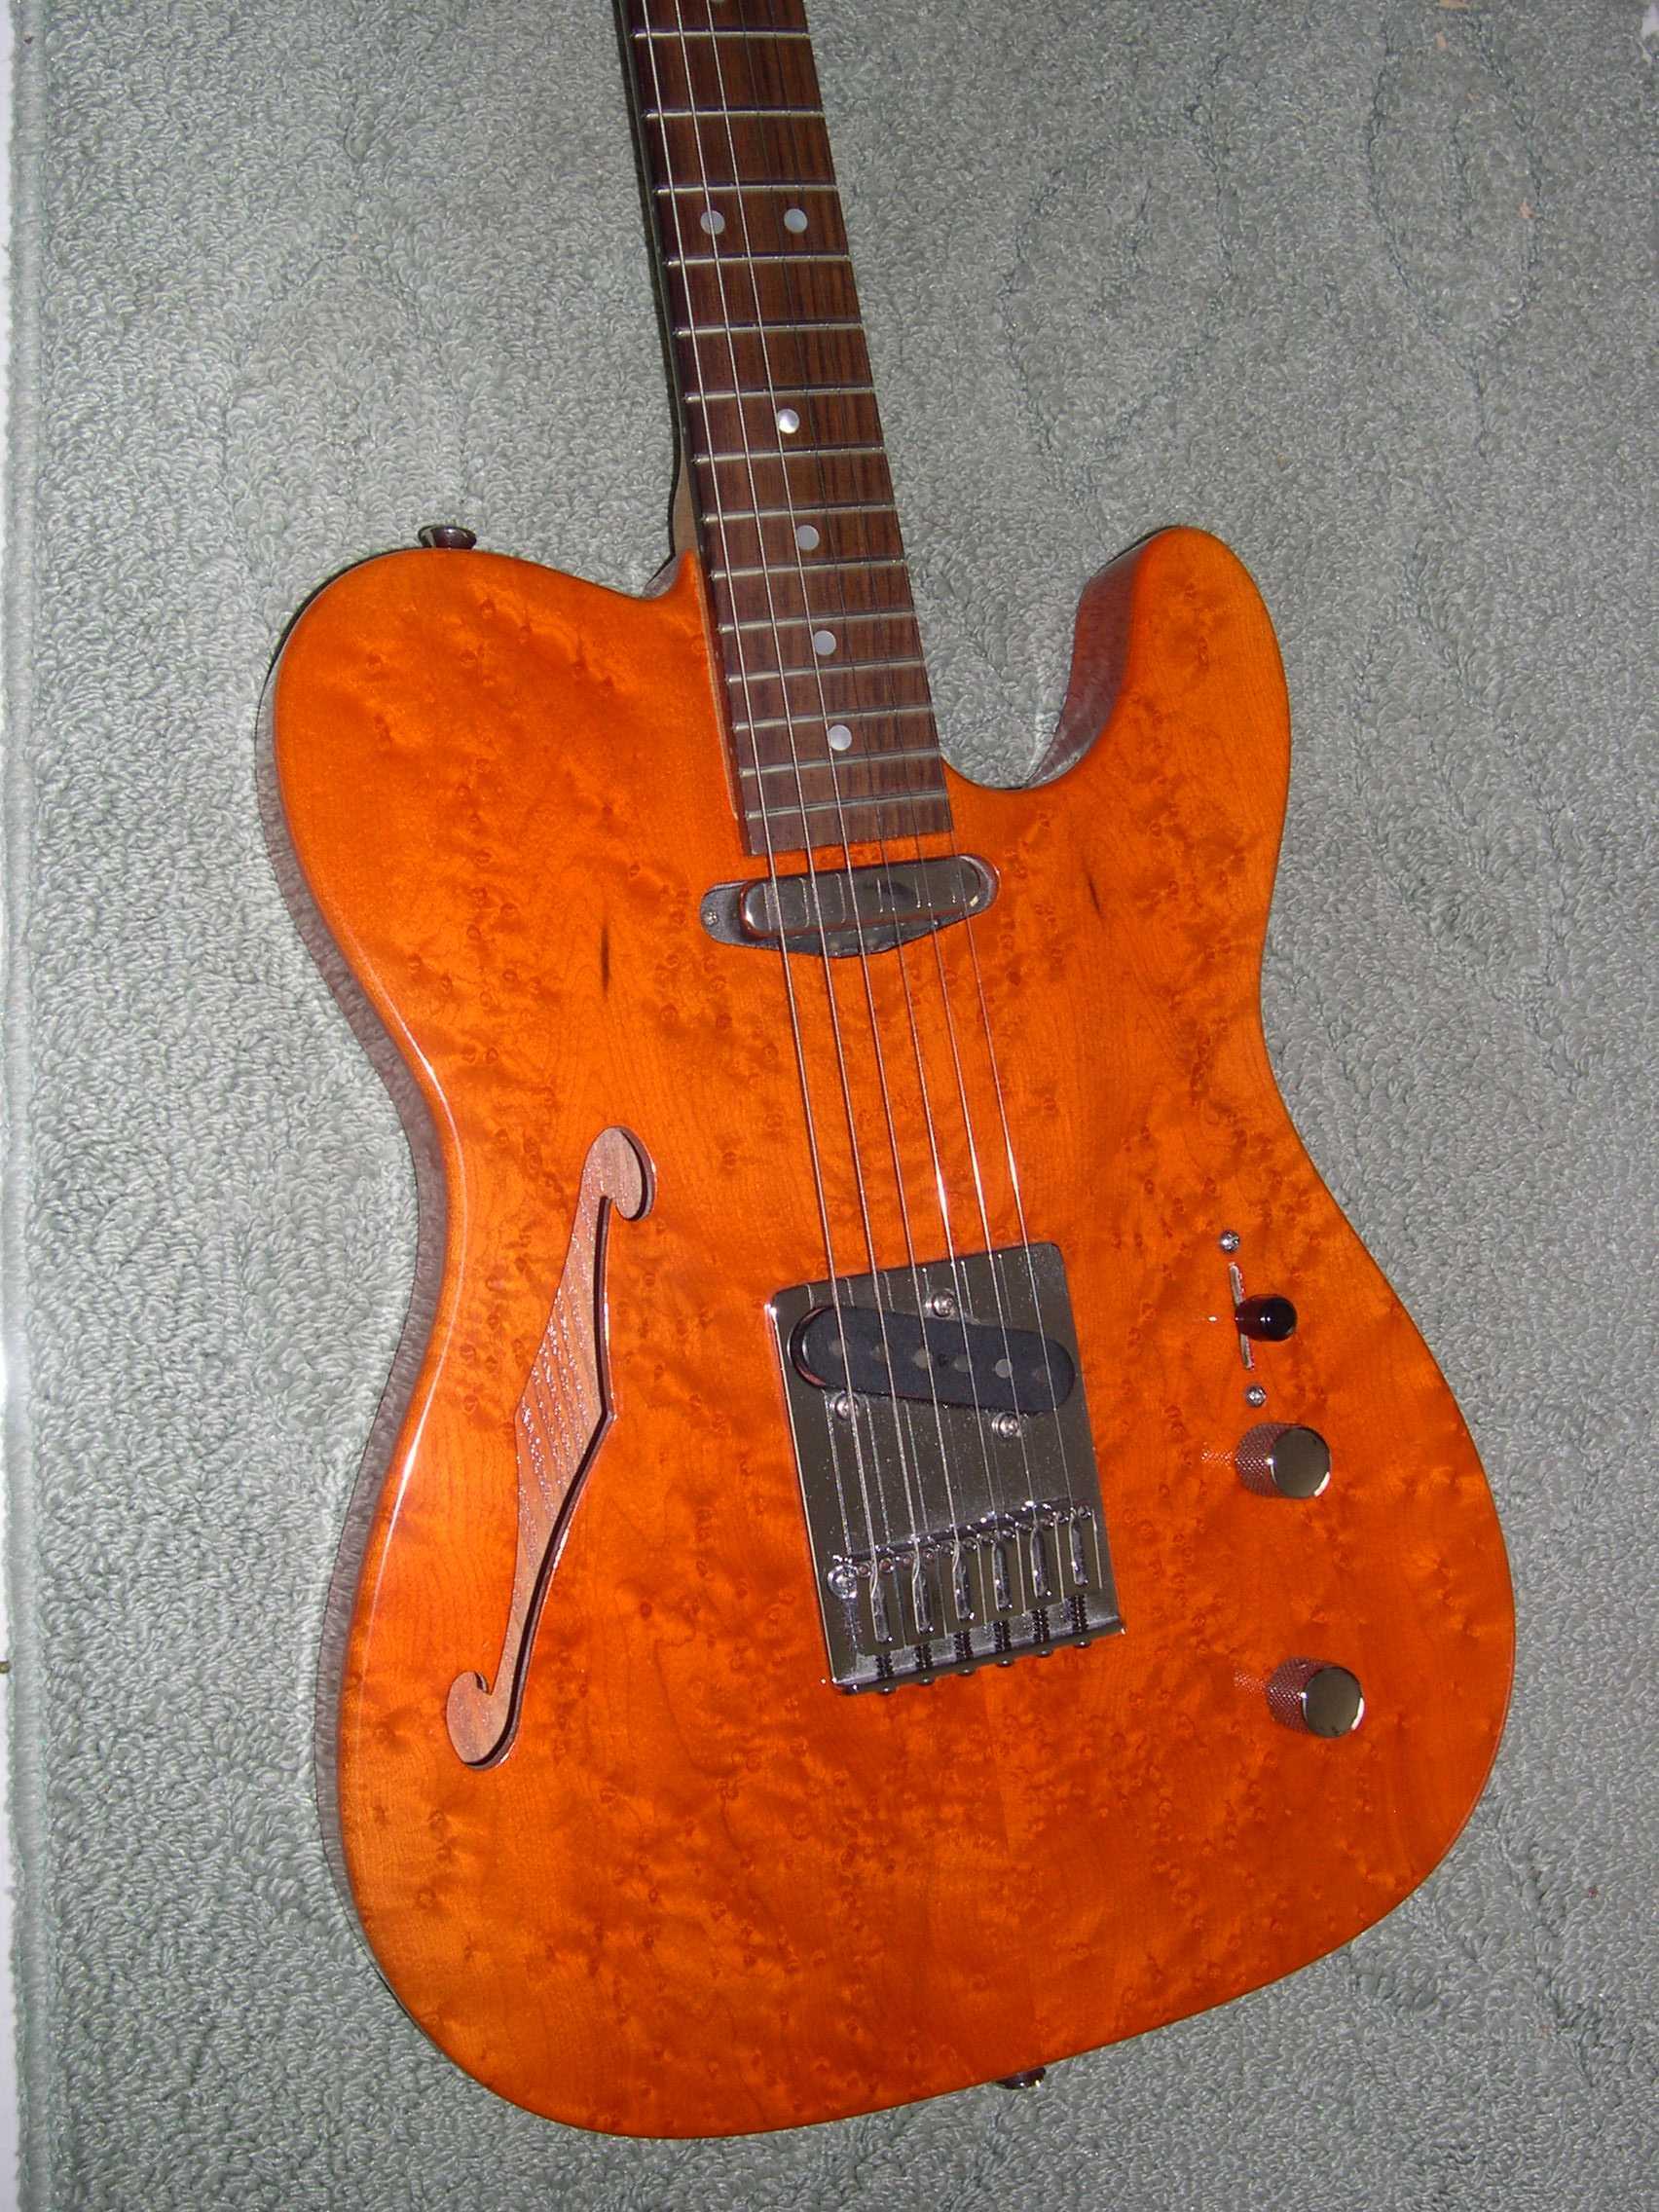 bozo 39 s fender guitar pages 1992 warmoth thinline telecaster. Black Bedroom Furniture Sets. Home Design Ideas